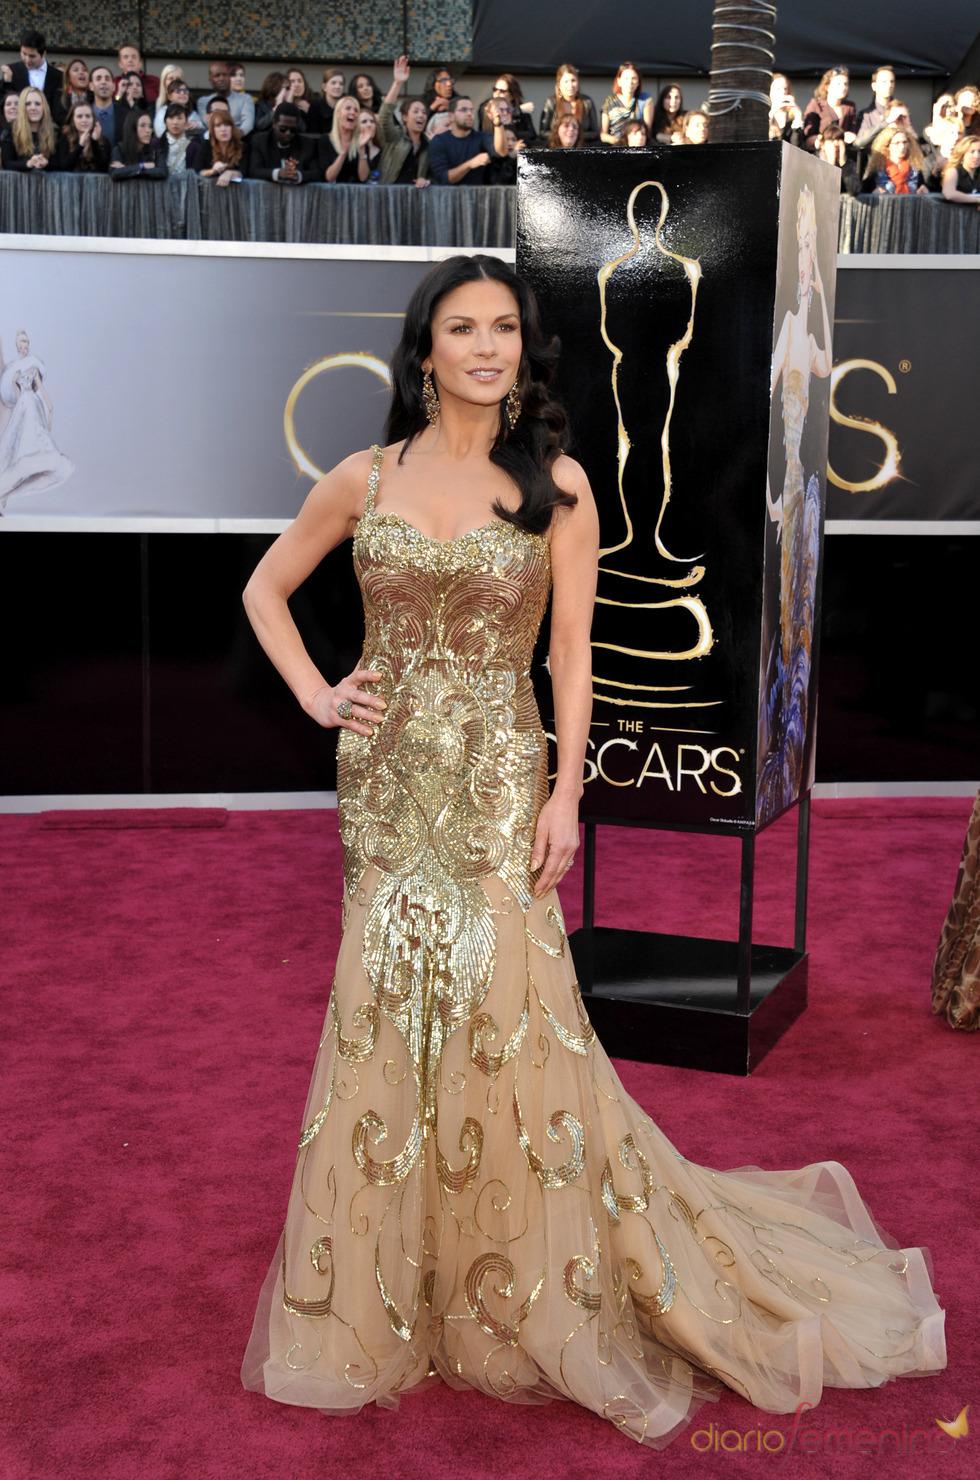 Catherine Zeta-Jones en la alfombra roja de los Oscars 2013